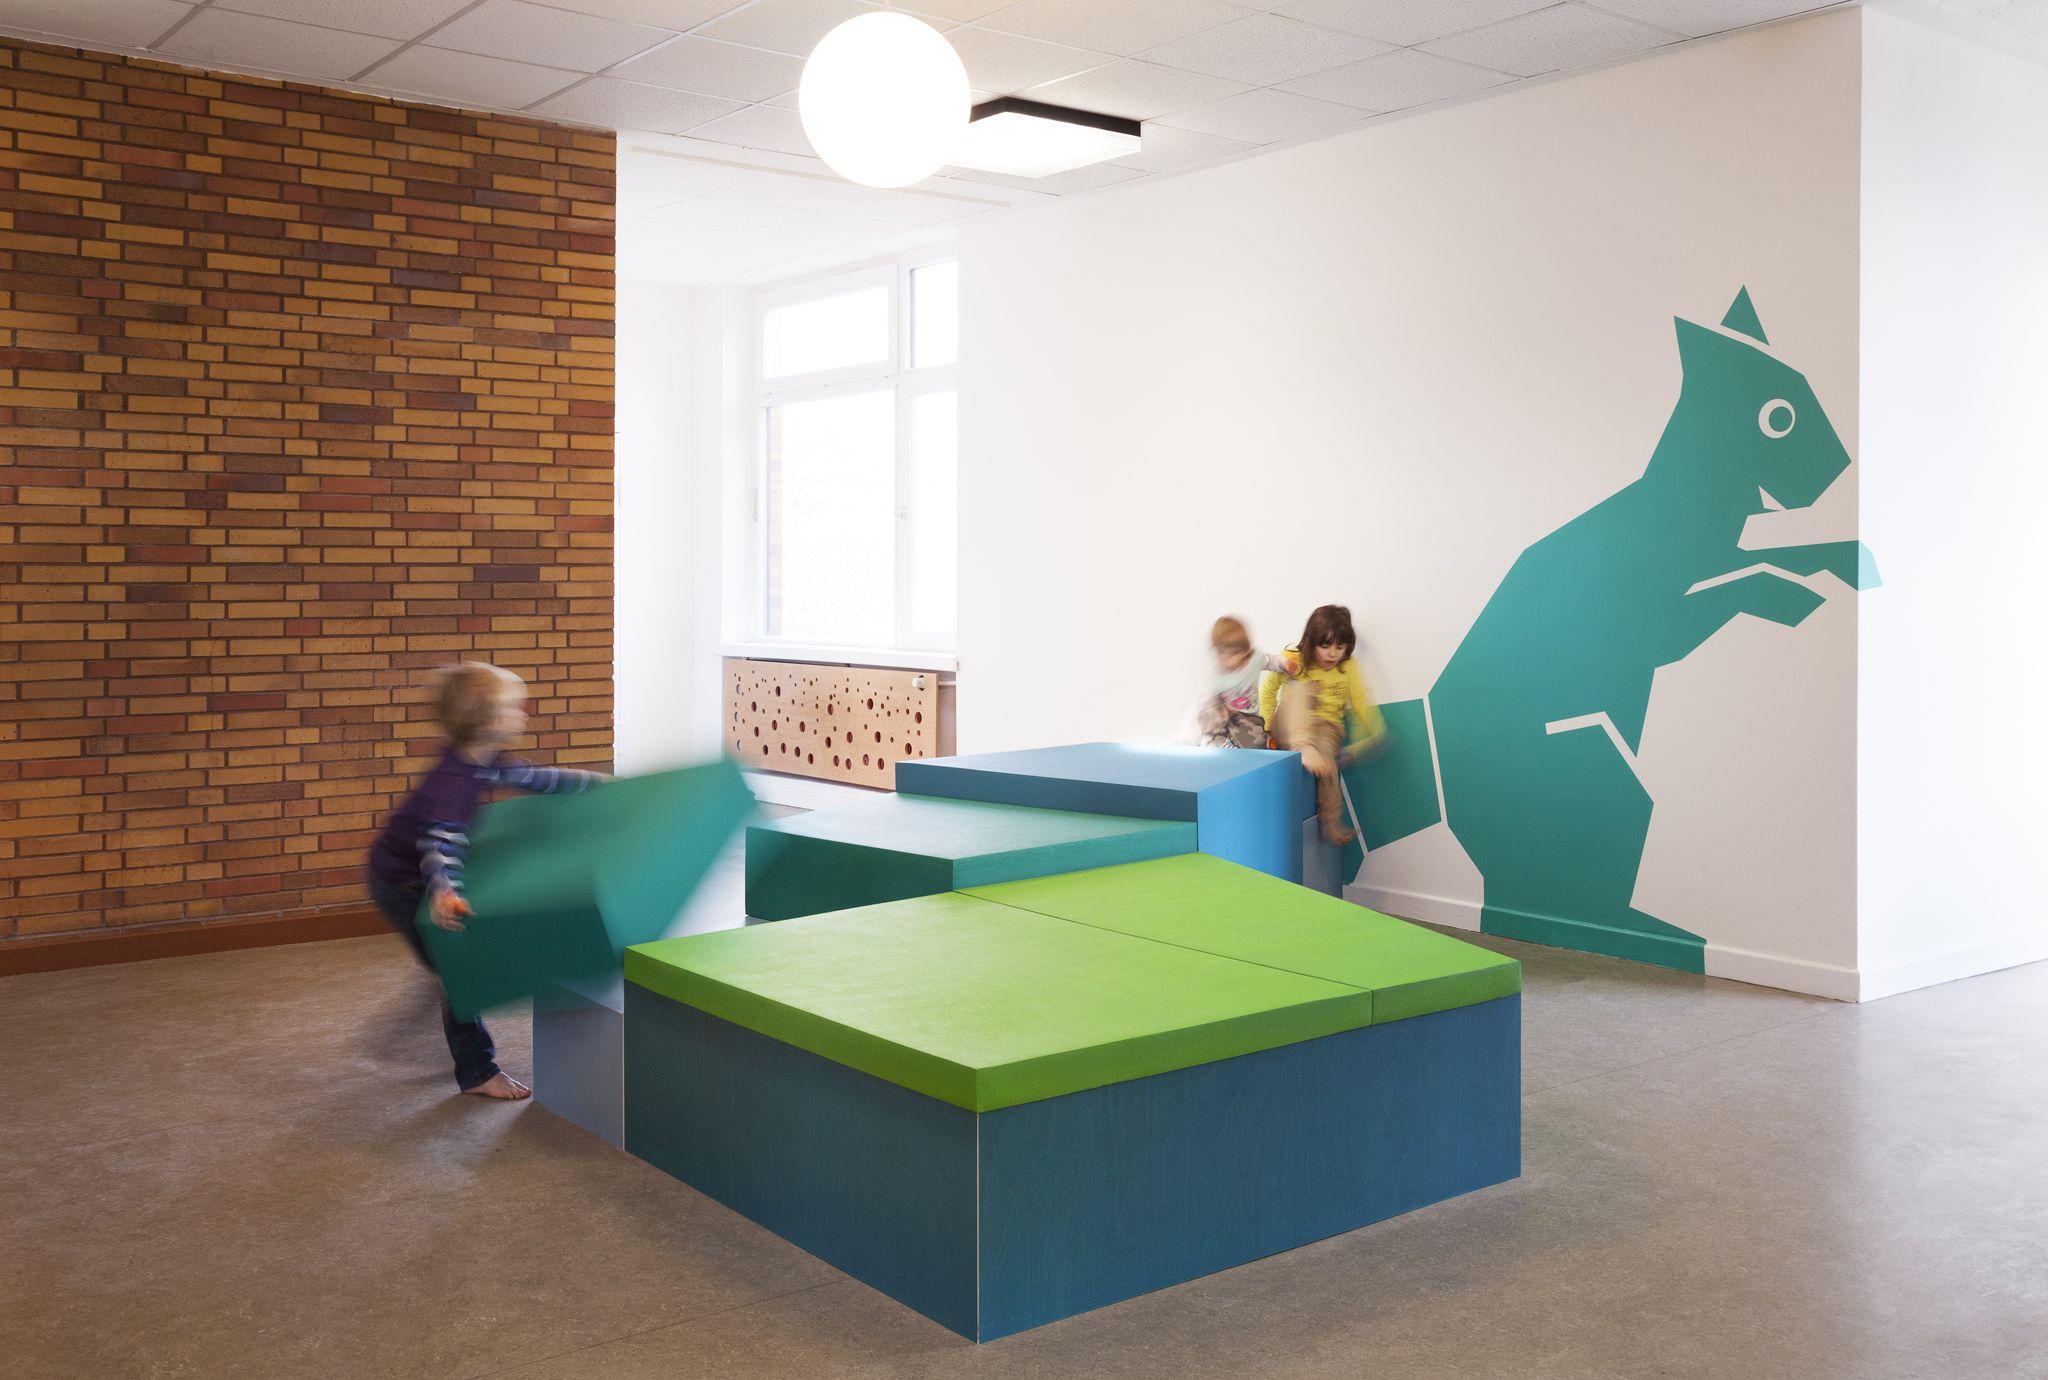 sinnewandel kindergarten in berlin designed by baukind and atelier perela giant animals induce. Black Bedroom Furniture Sets. Home Design Ideas